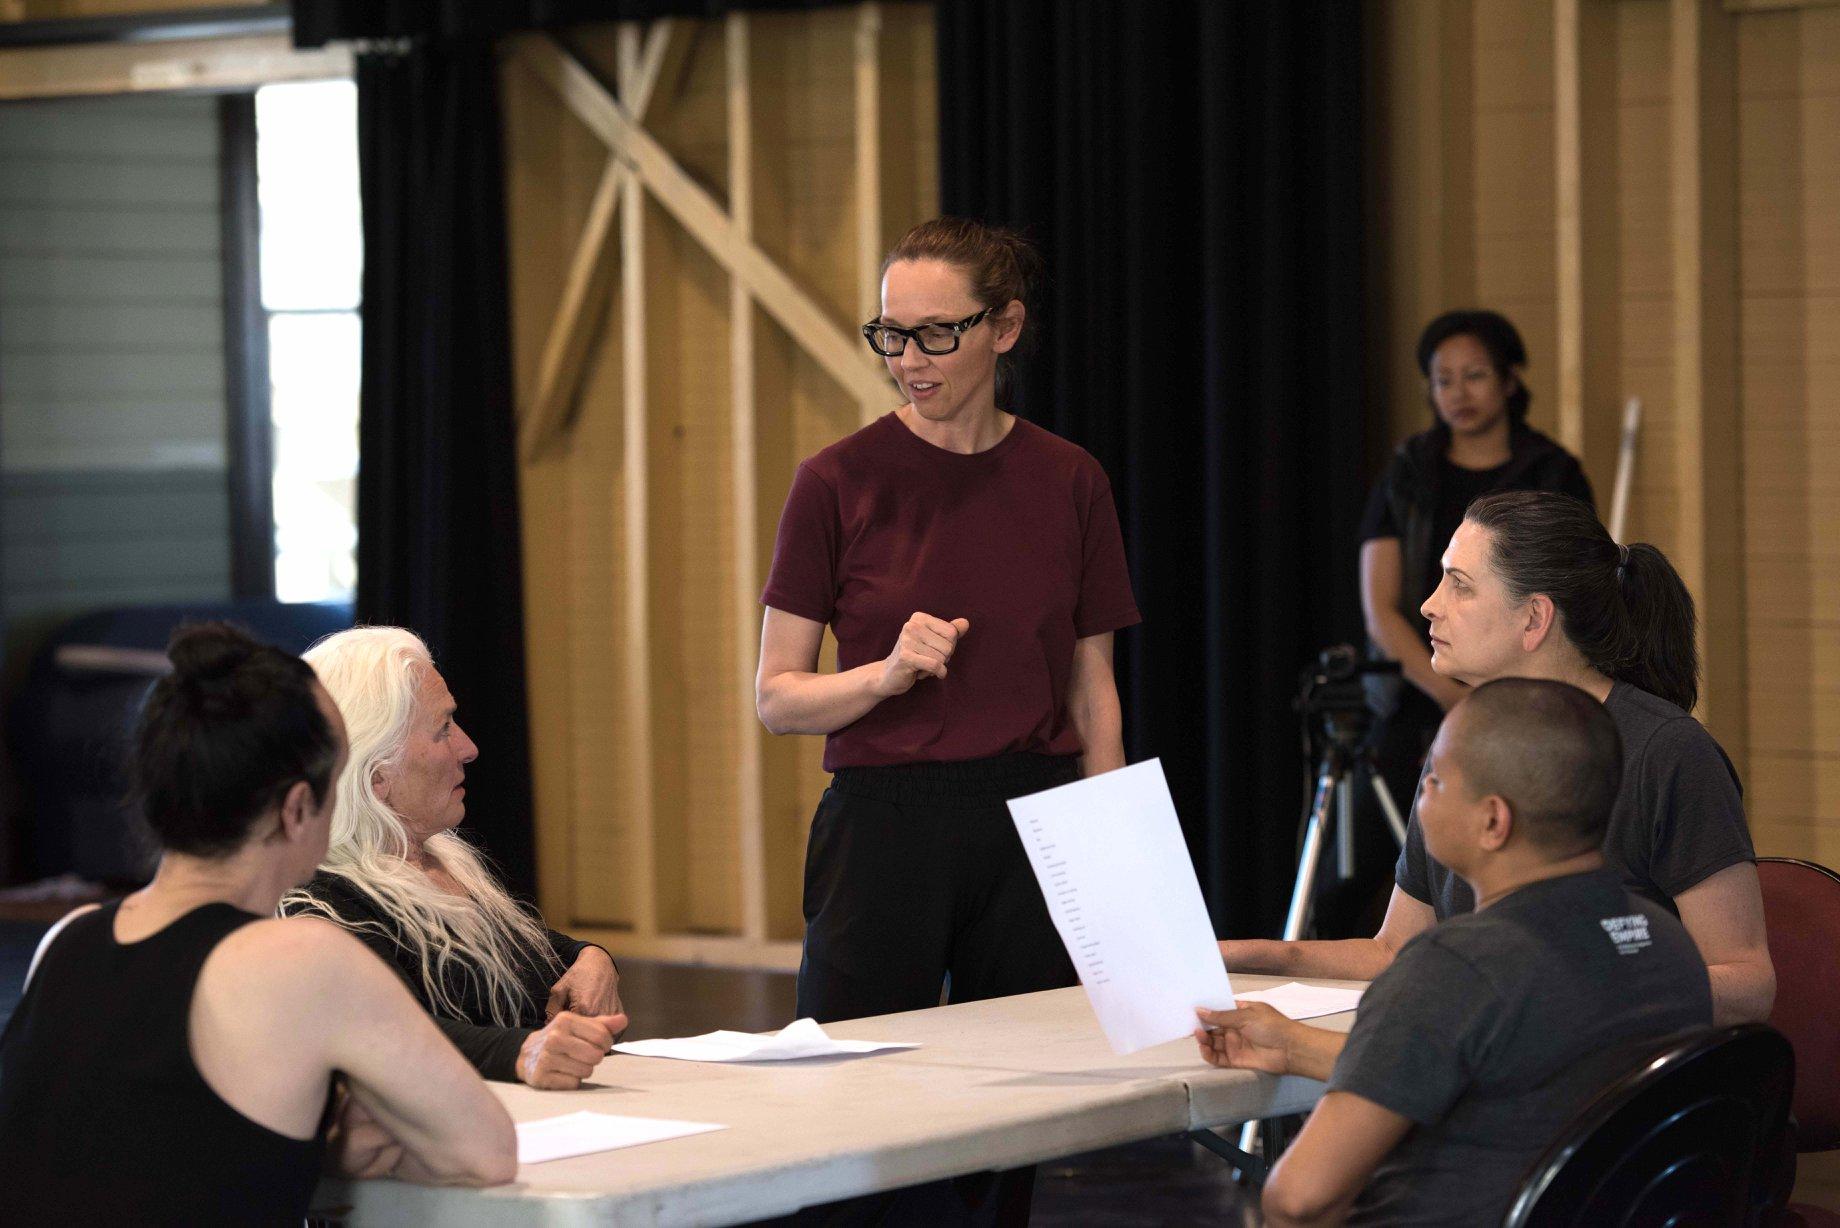 Danielle Micich directing Paul Capsis, Olwen Foréré, Danielle Micich, Pamela Rabe and Ursula Yovich in Creative development for Four Seasons. 2019. Photo by Ashley de Prazer